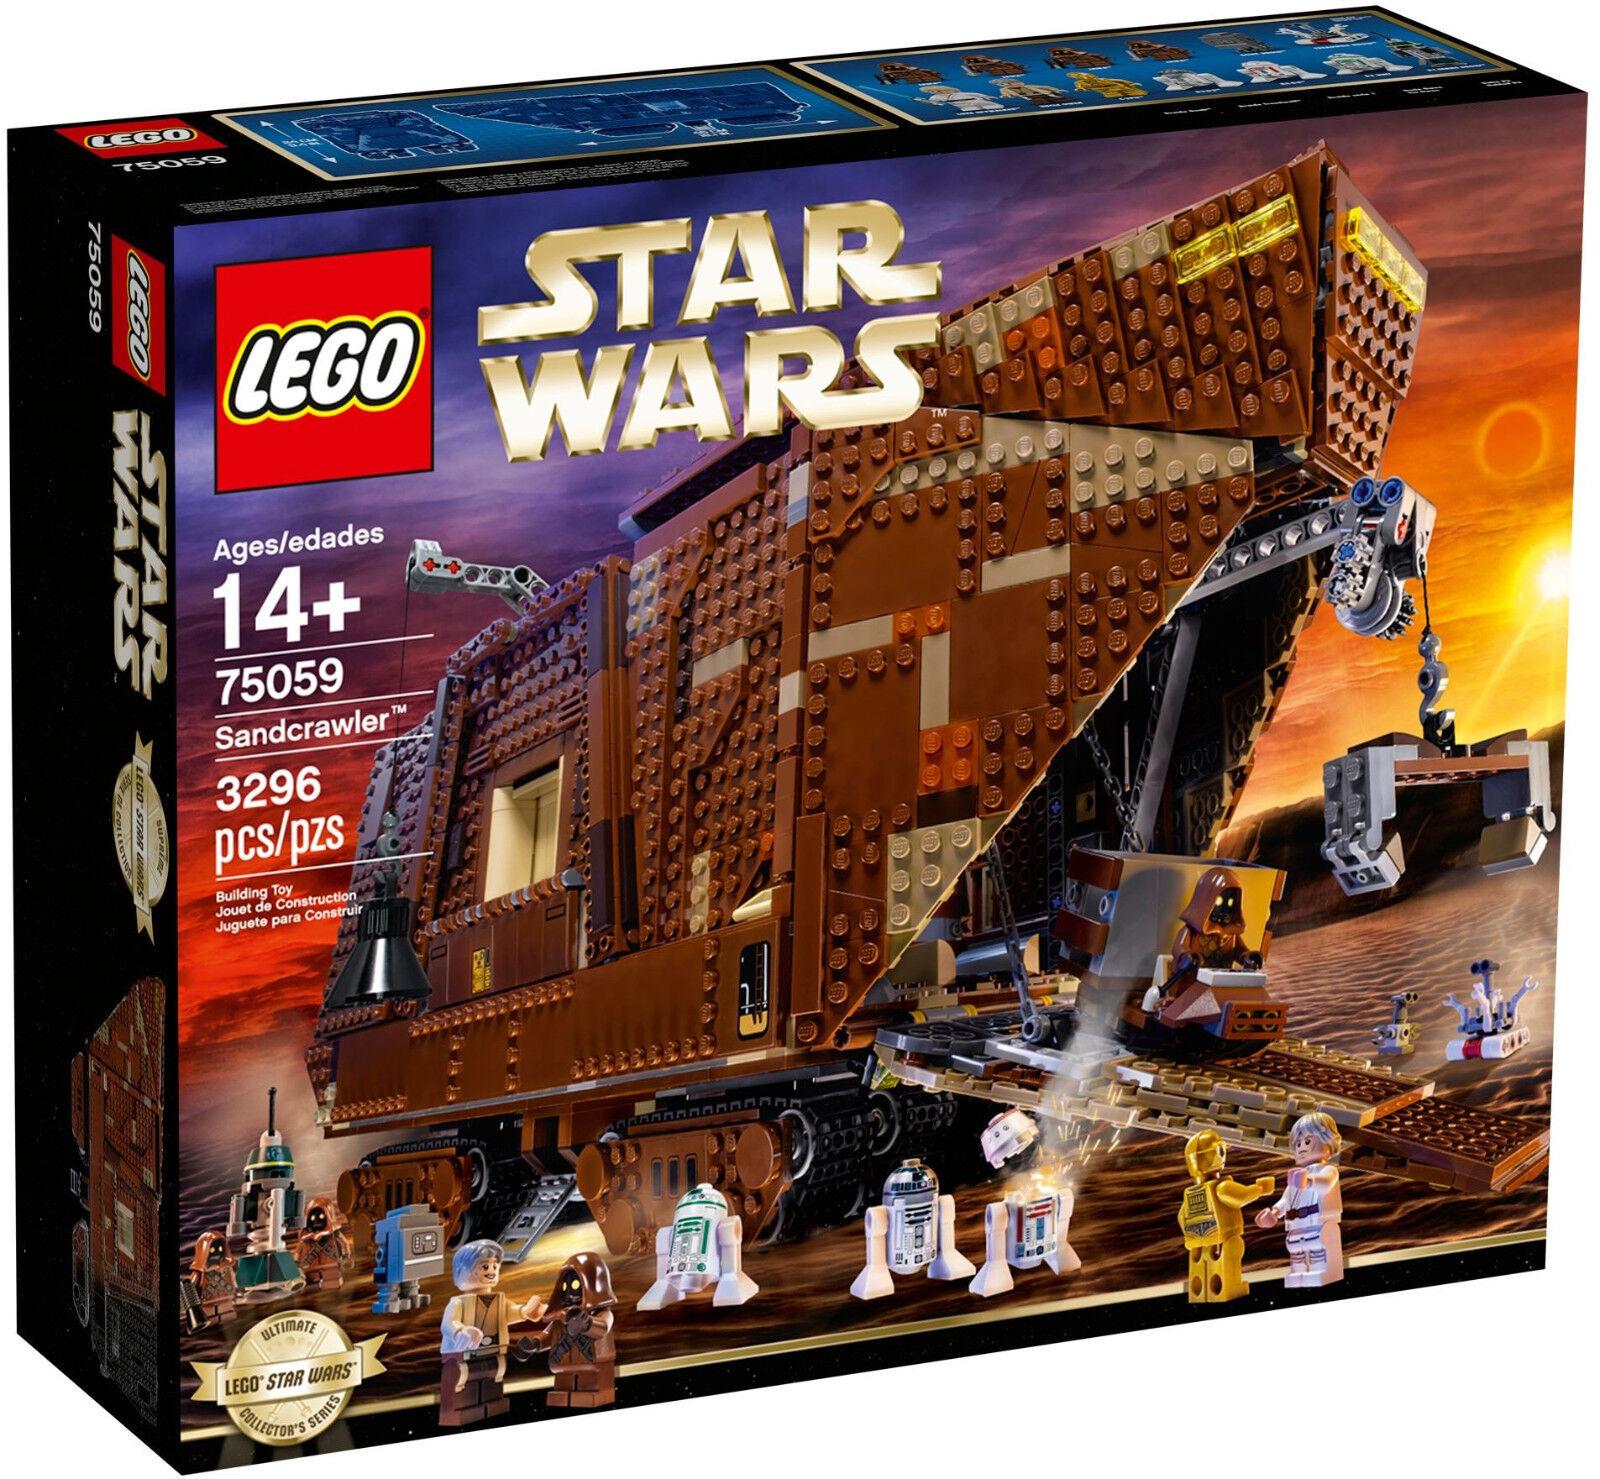 LEGO star wars-En exclusivité 75059 sandcrawler M. r5-d8, Owen Lars & JAWA-NEUF emballage d'origine